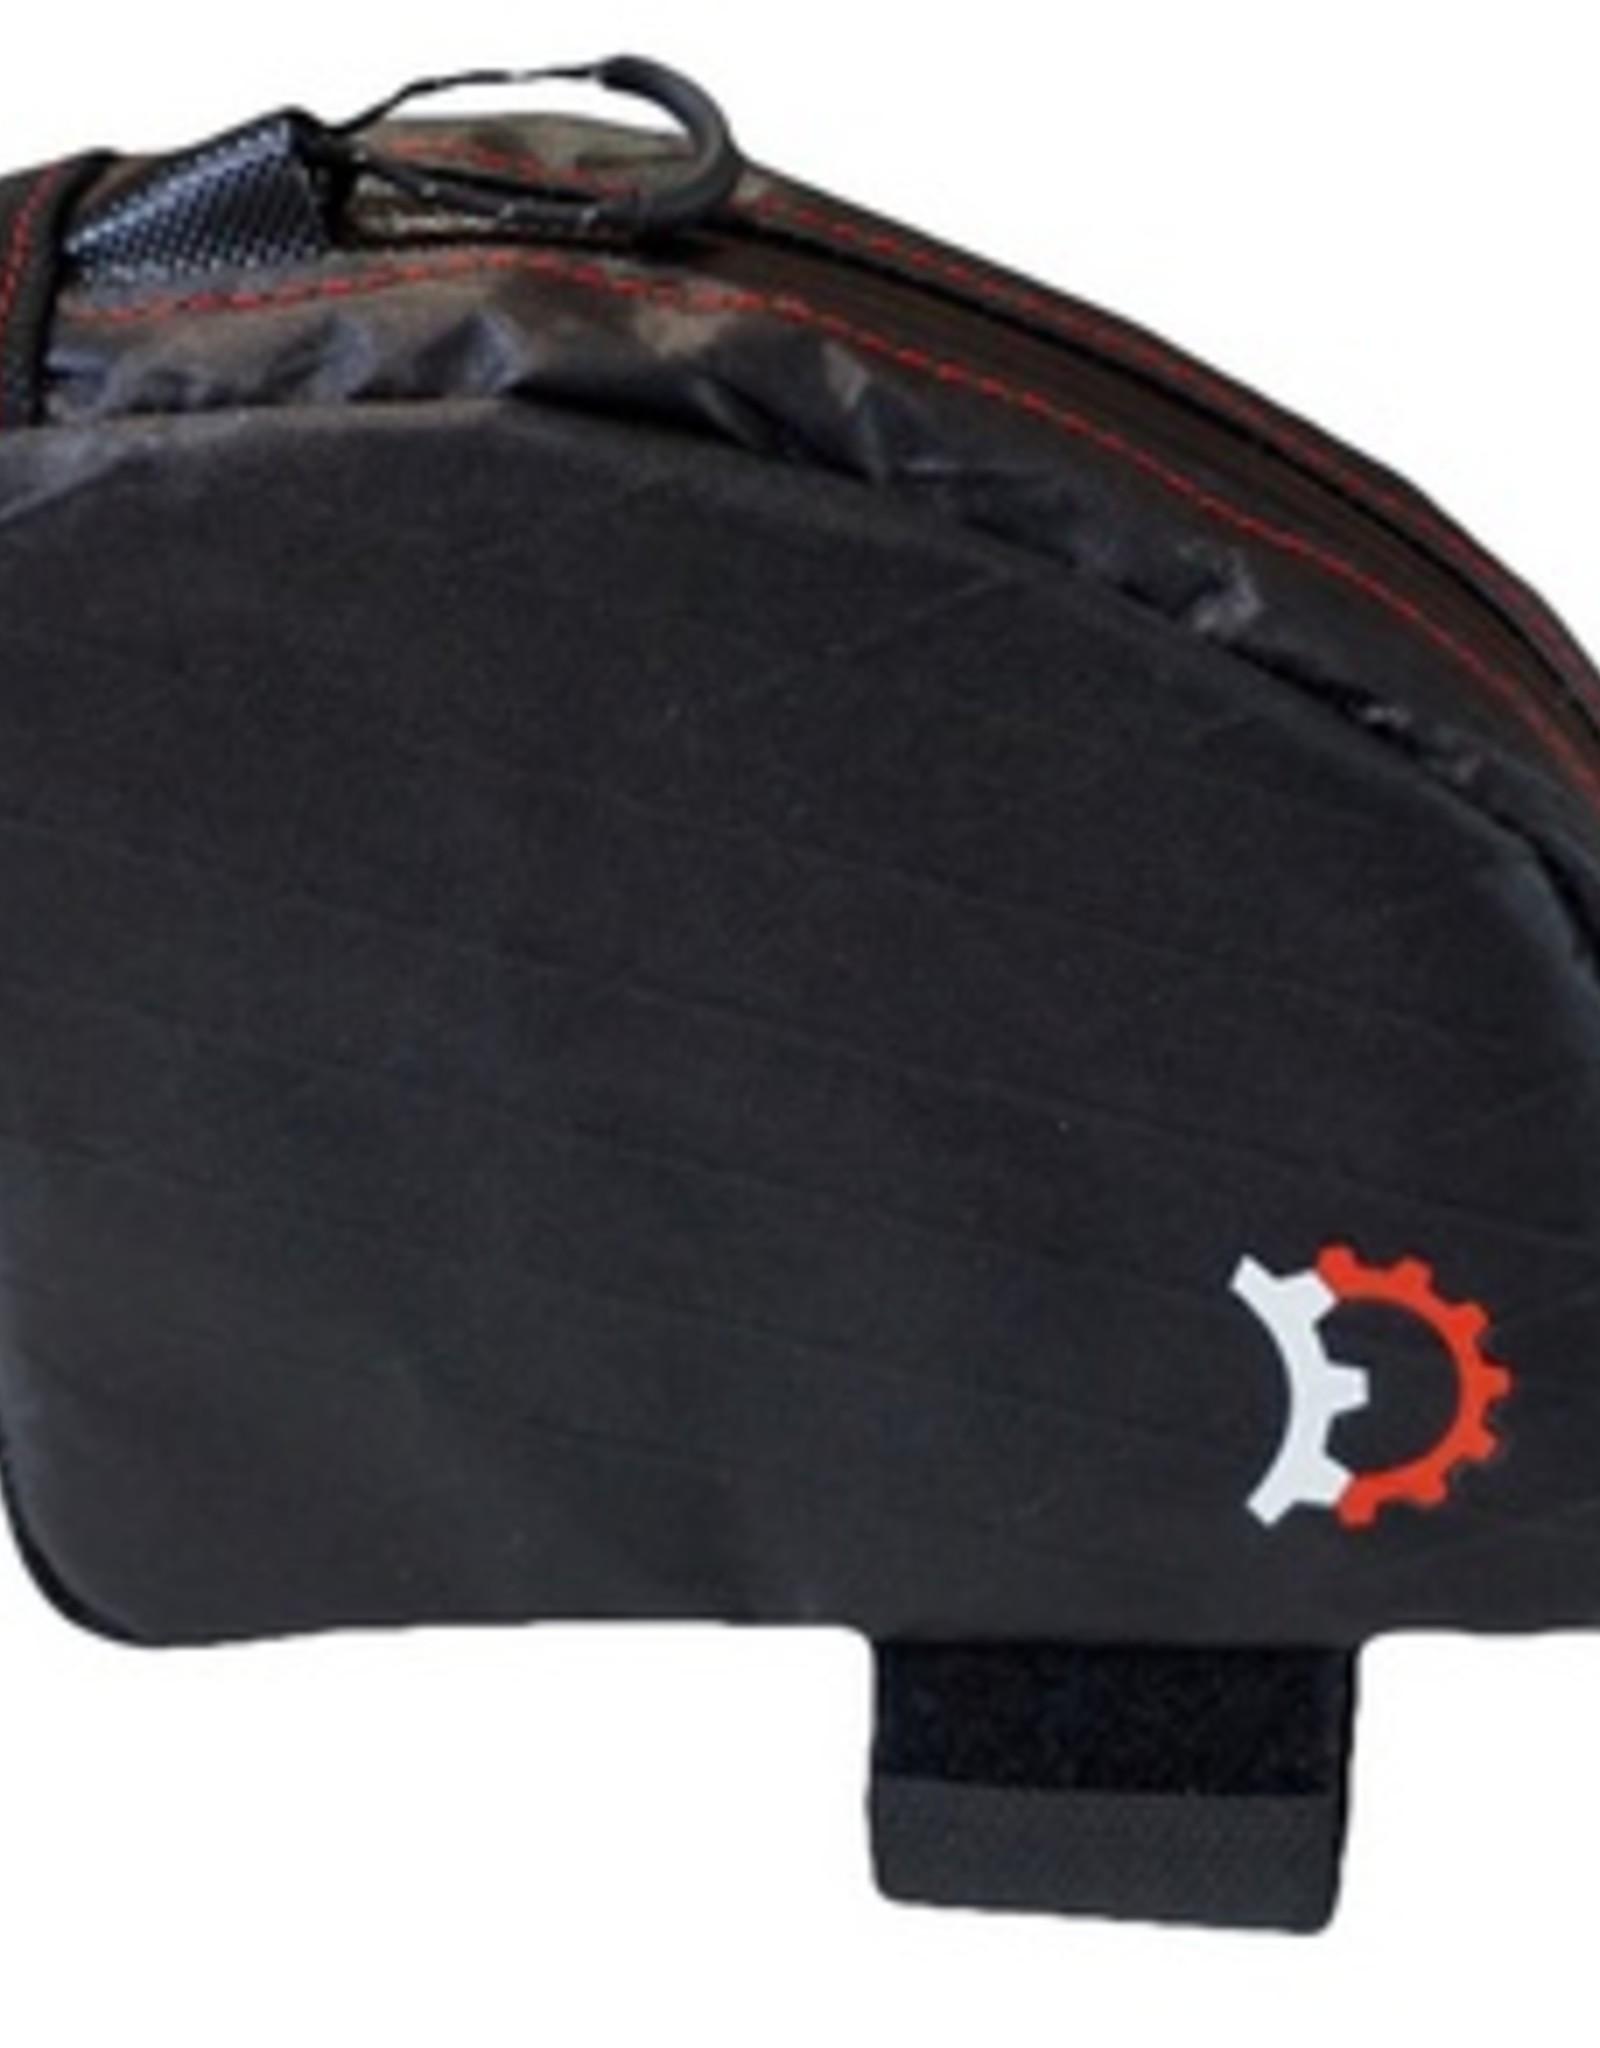 Revelate Designs Revelate Jerry Can Bent Black Top Tube Bag